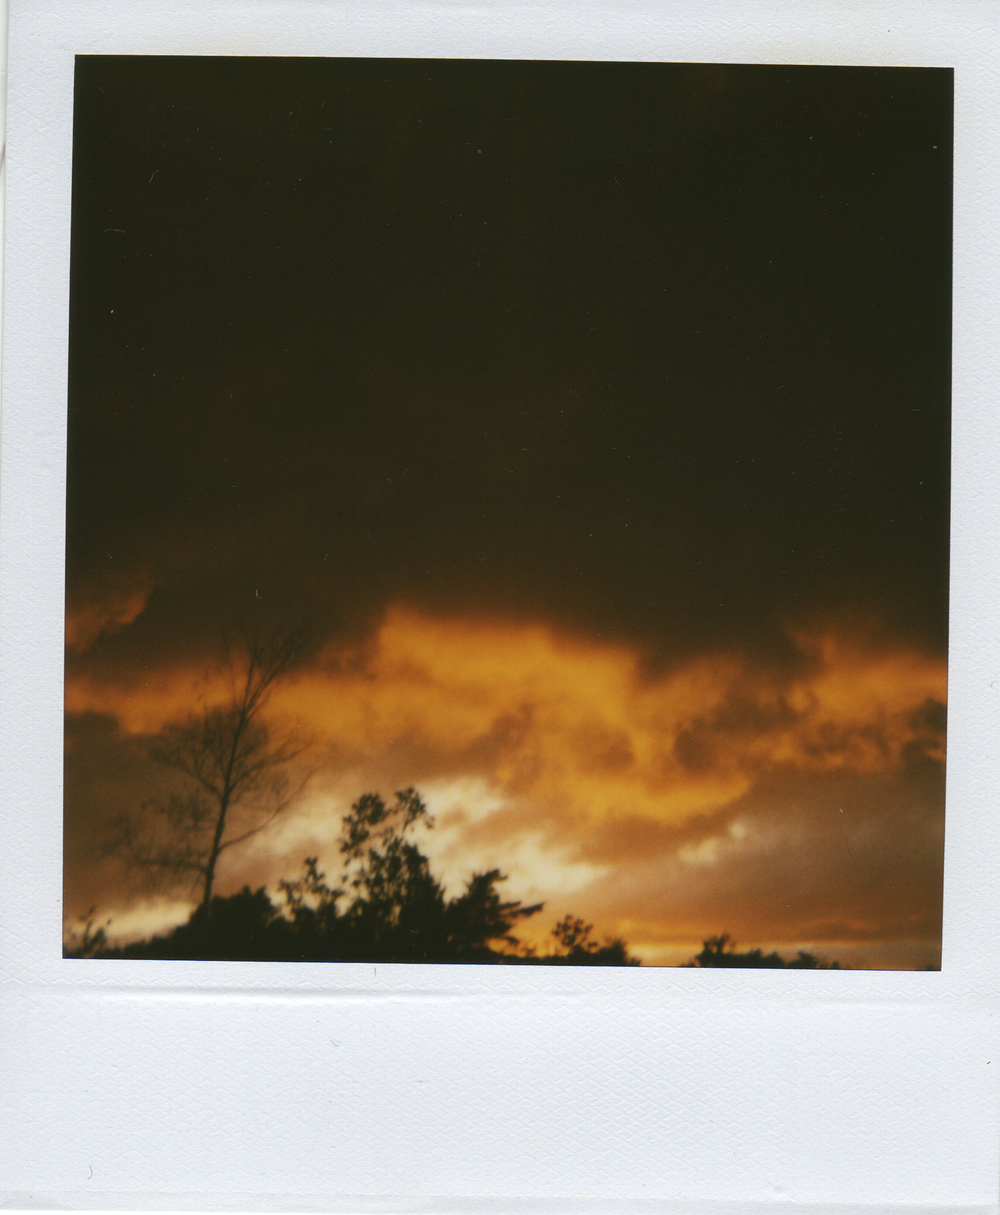 jlaurence-polaroid-012.jpg